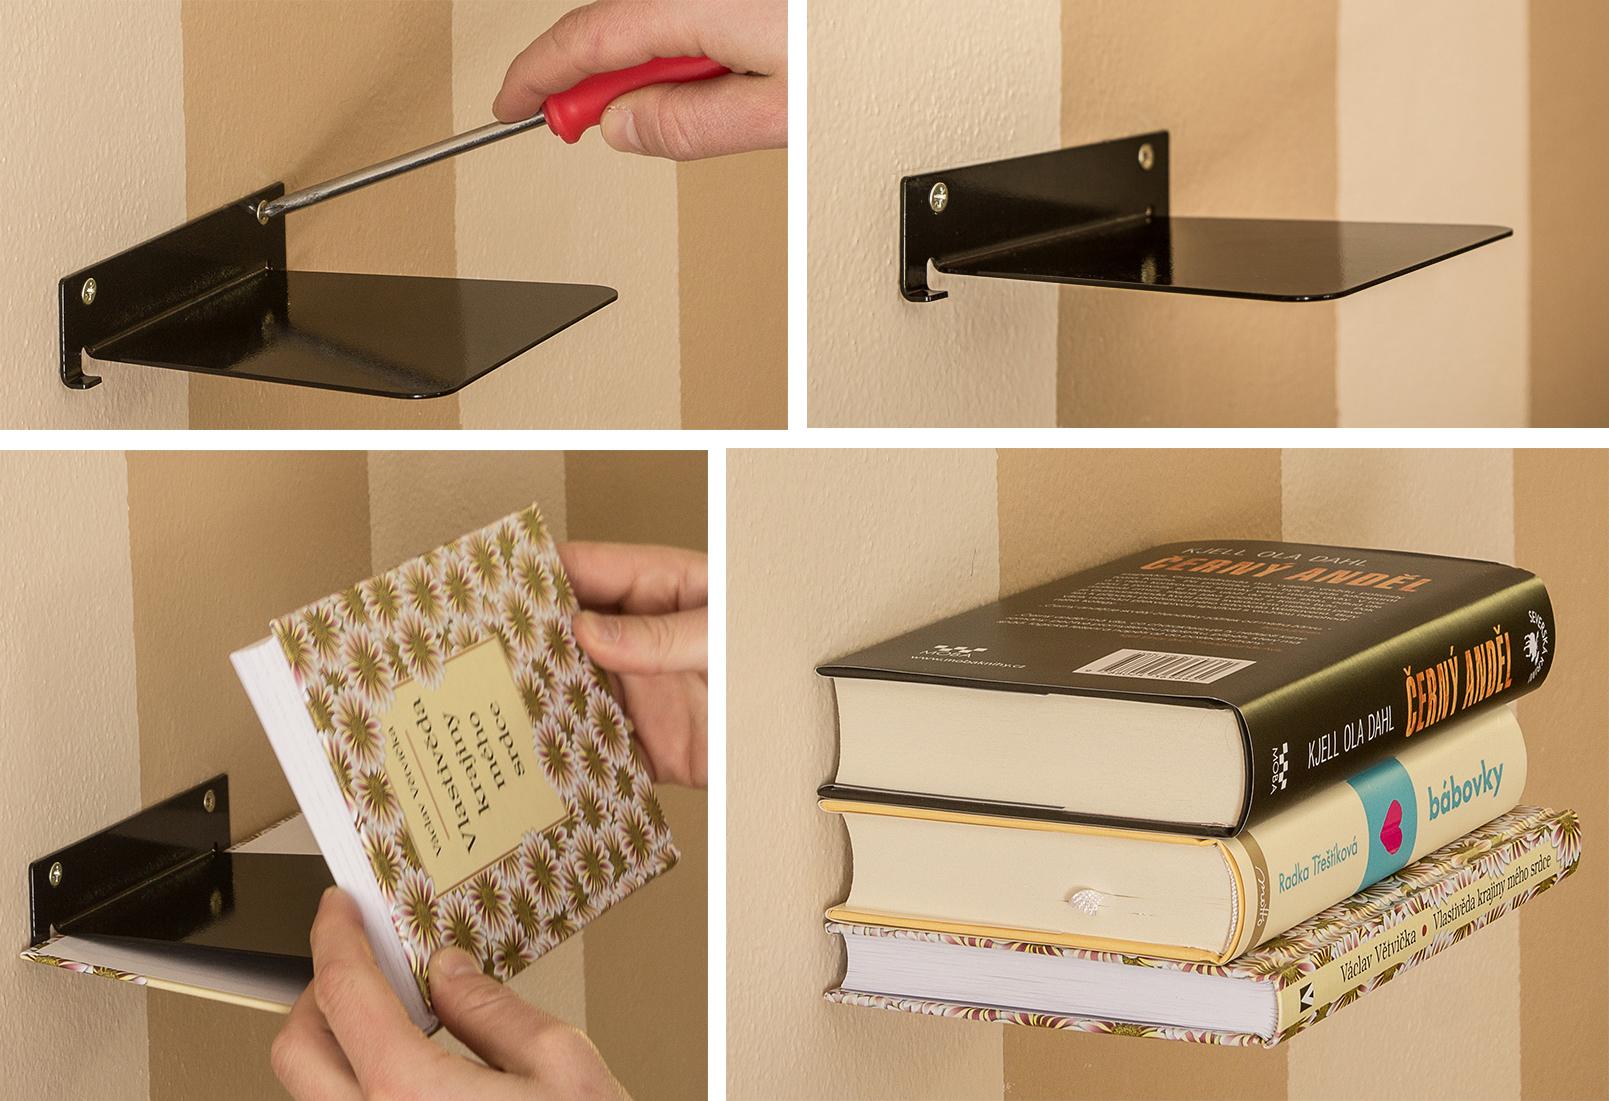 neviditelna-police-montaz-a-umisteni-knih